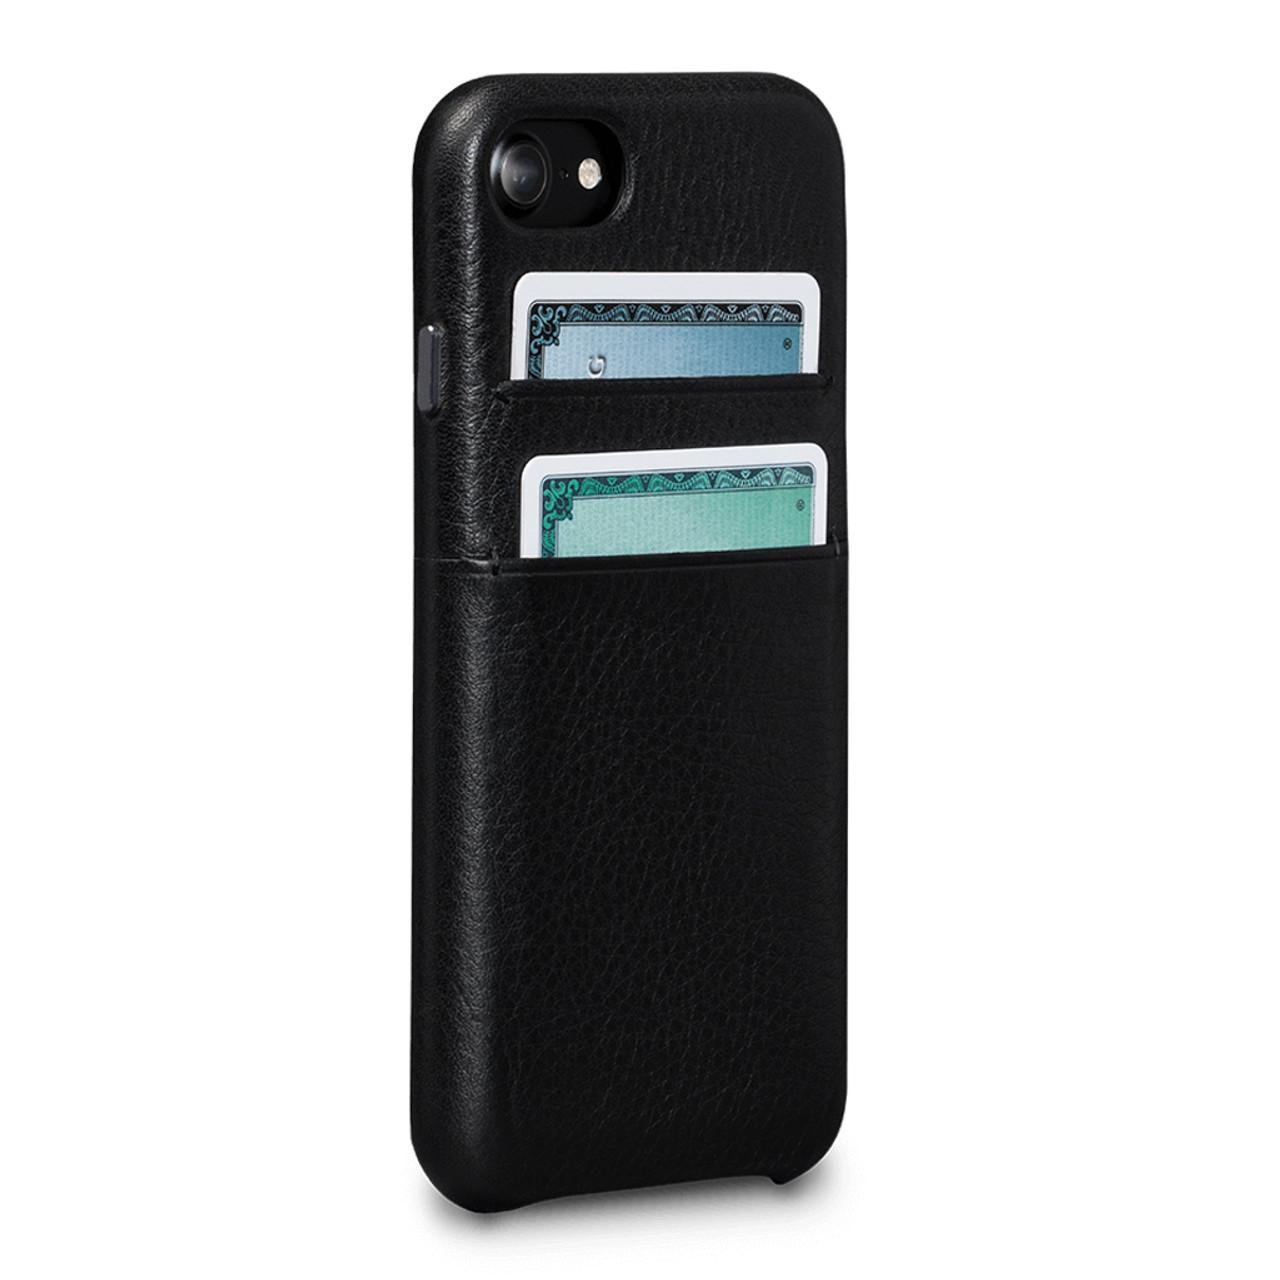 best website 0eefd fc2f7 SENA Bence Snap-on Wallet Case iPhone 8/7 - Black - Leather Case ...